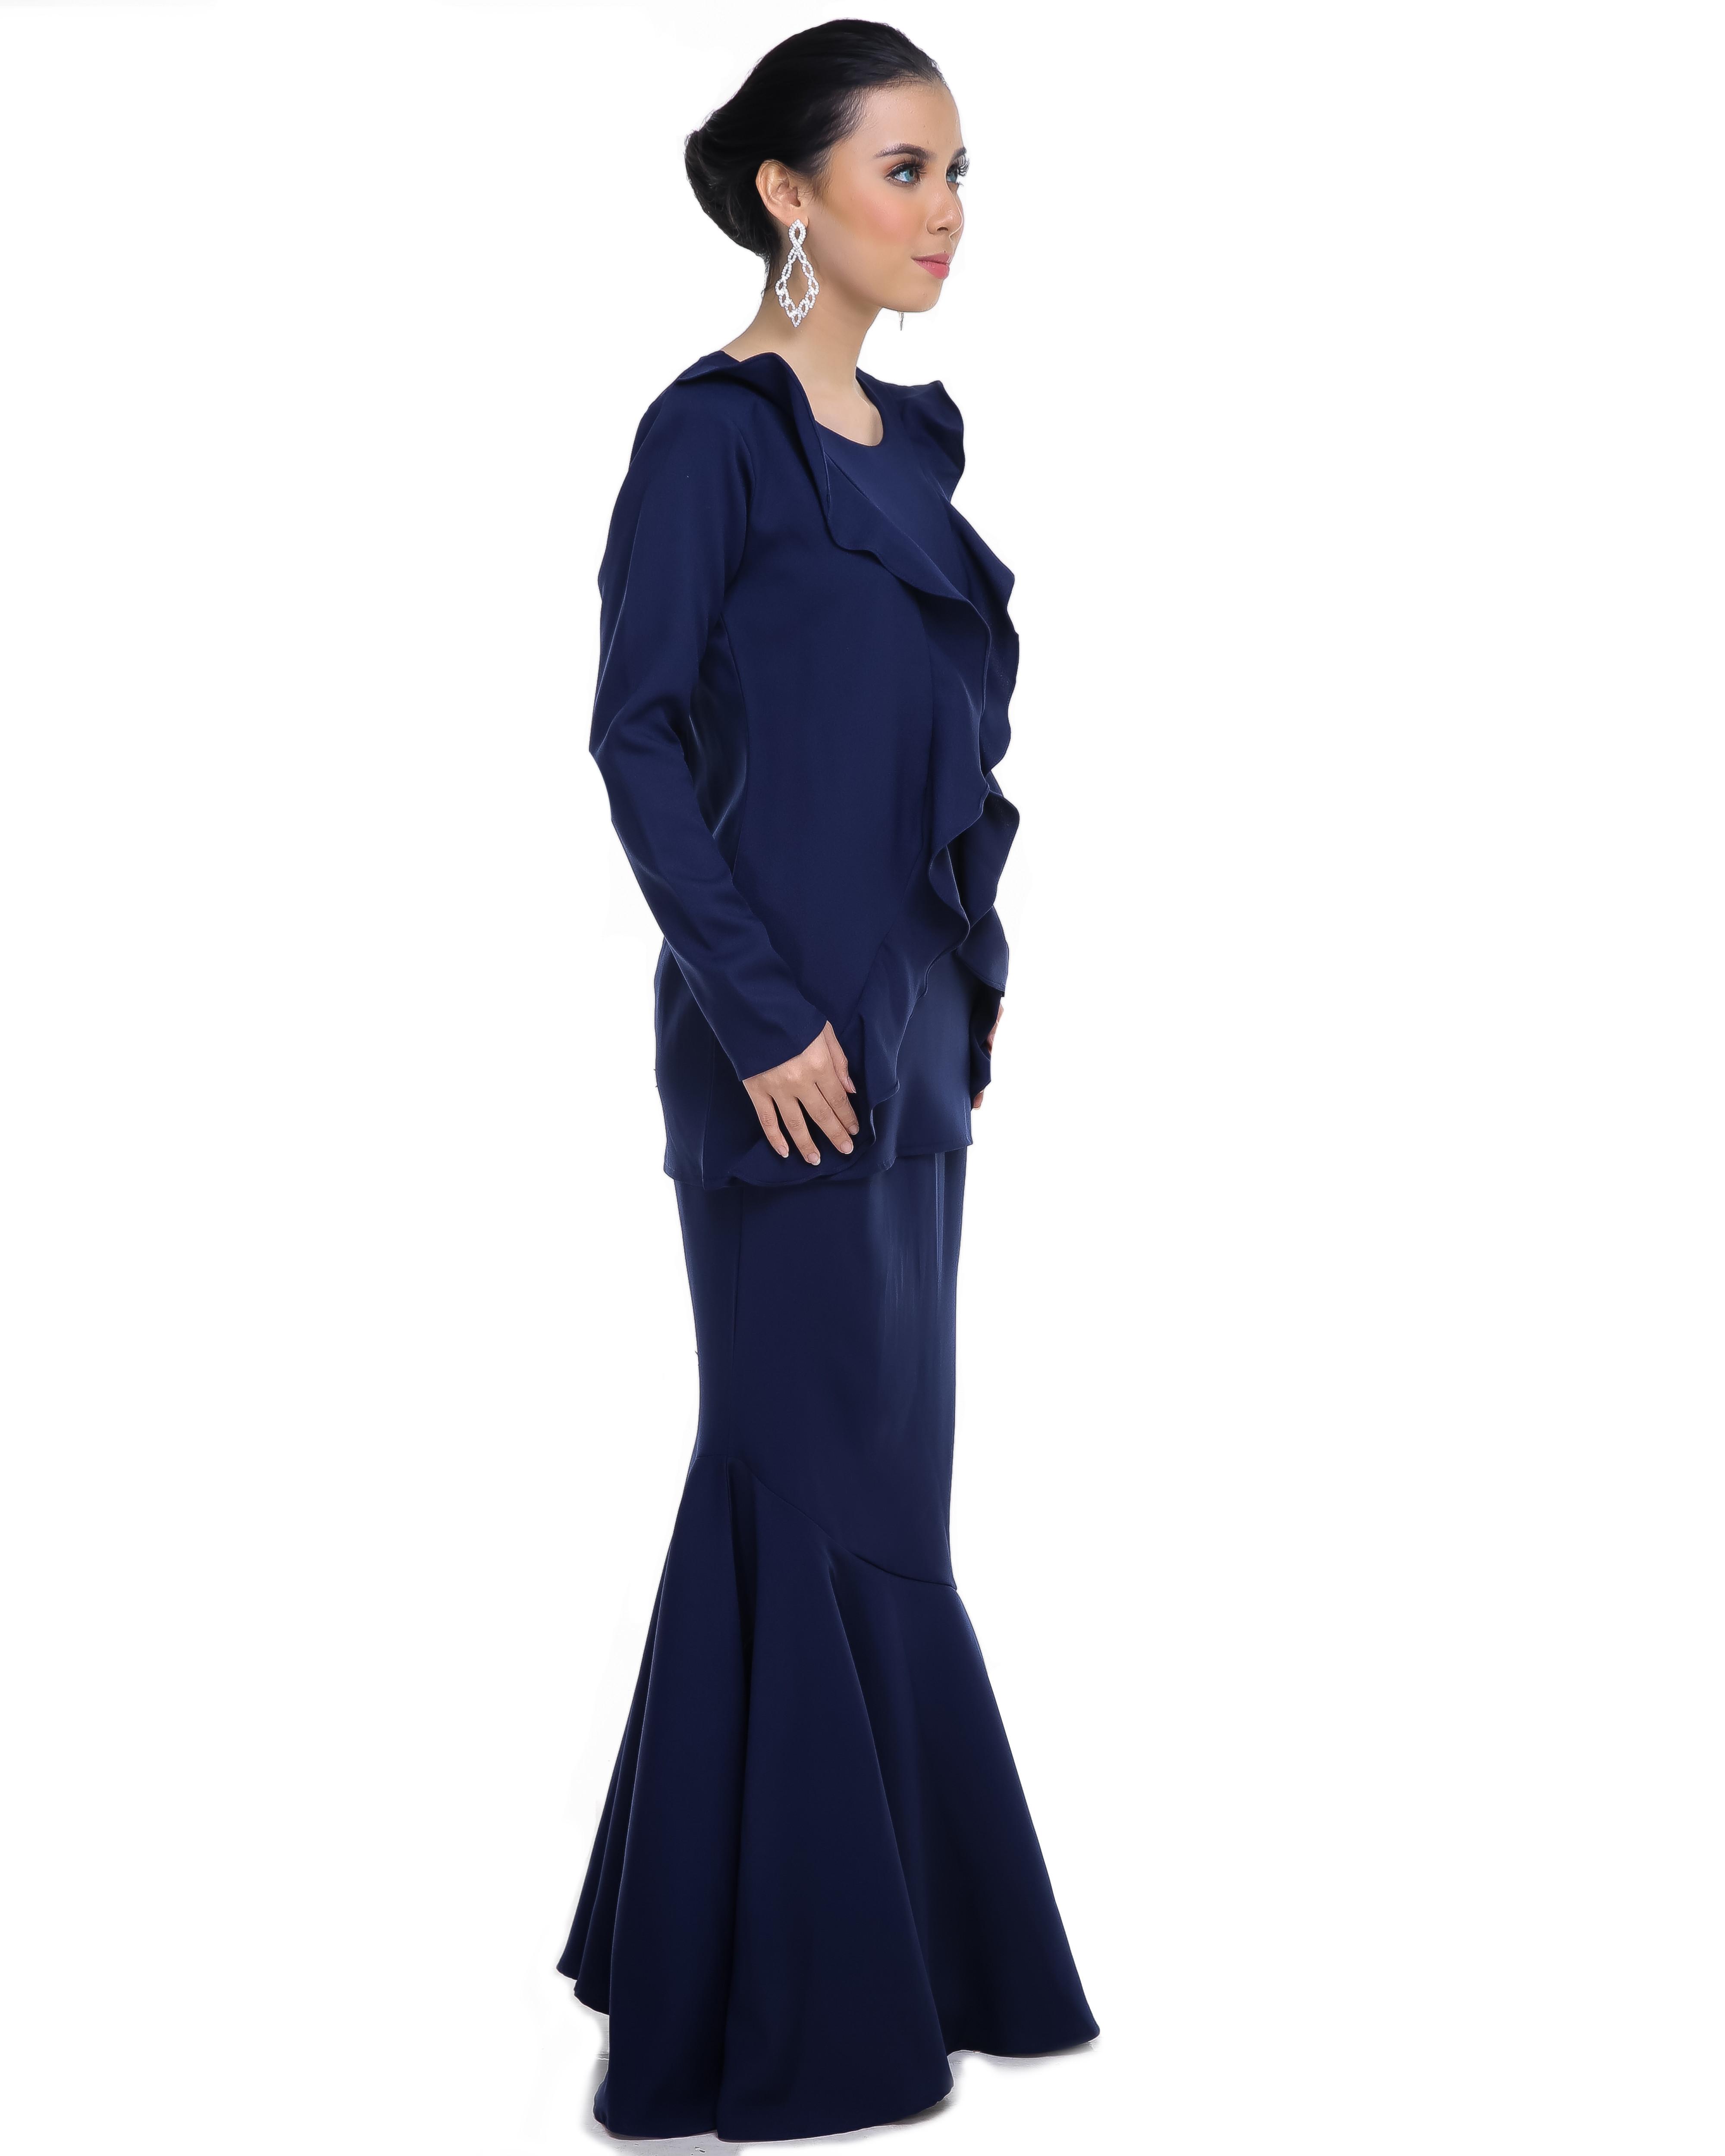 Aluna - Navy Blue